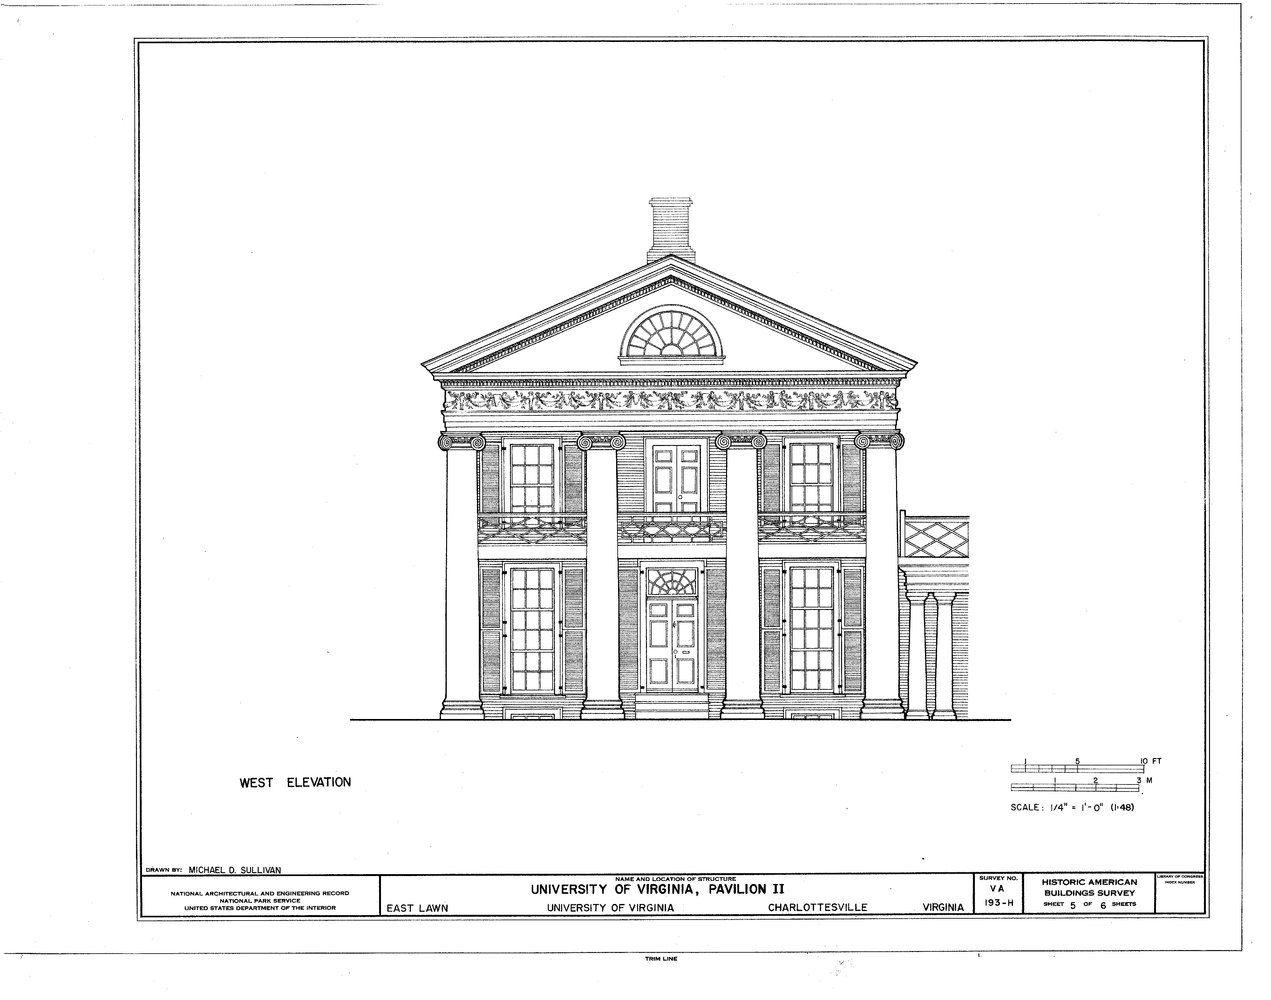 University Of Virginia Designed By Thomas Jefferson Thomas Jefferson Monticello And The U Of